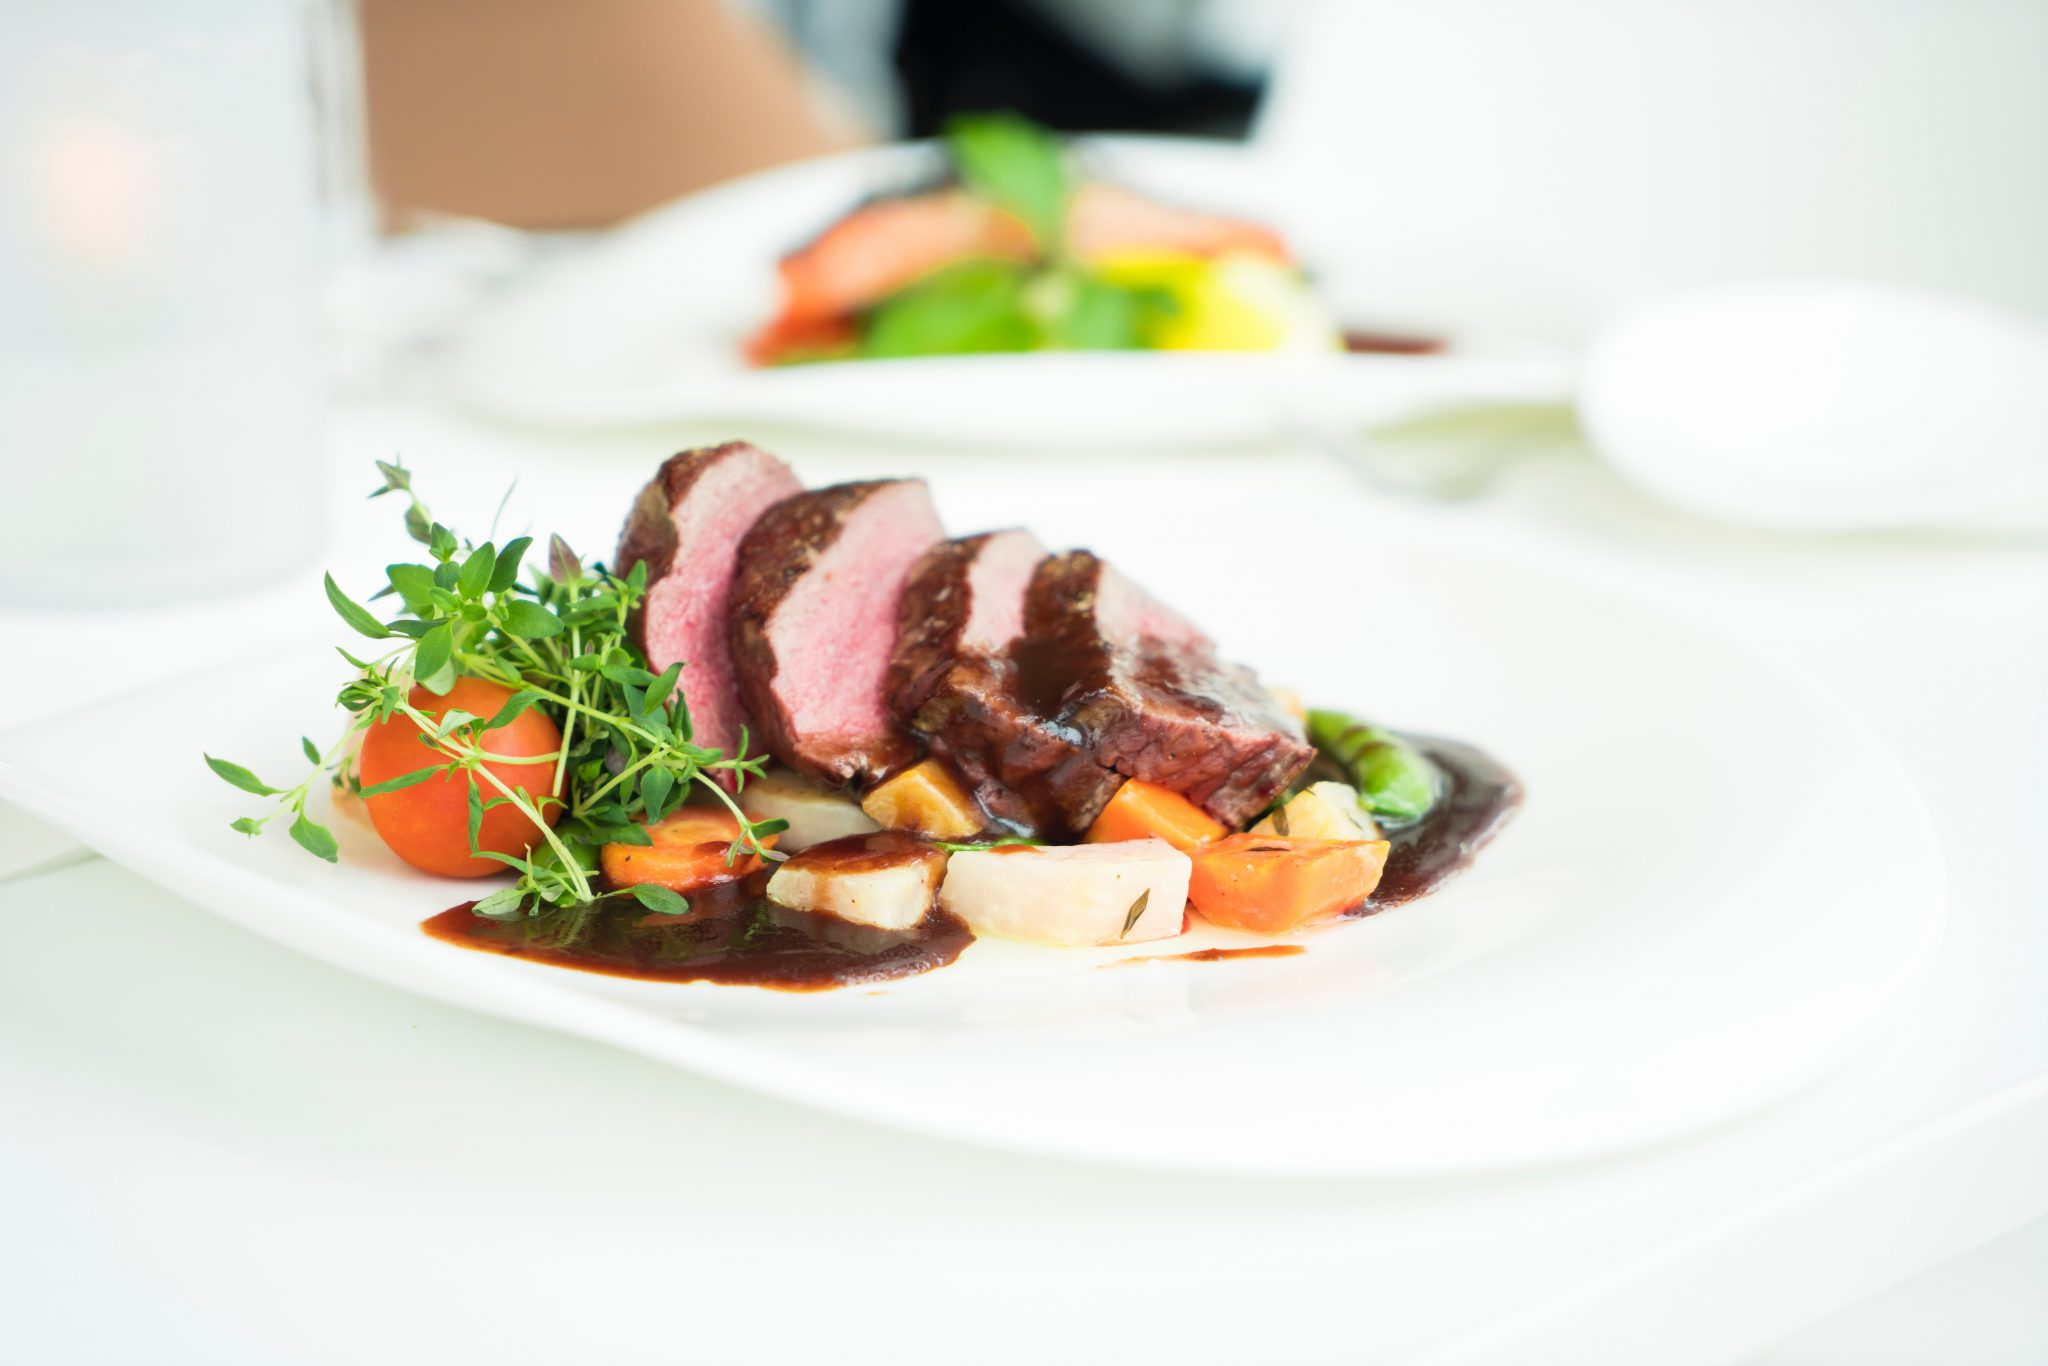 beef-cuisine-delicious